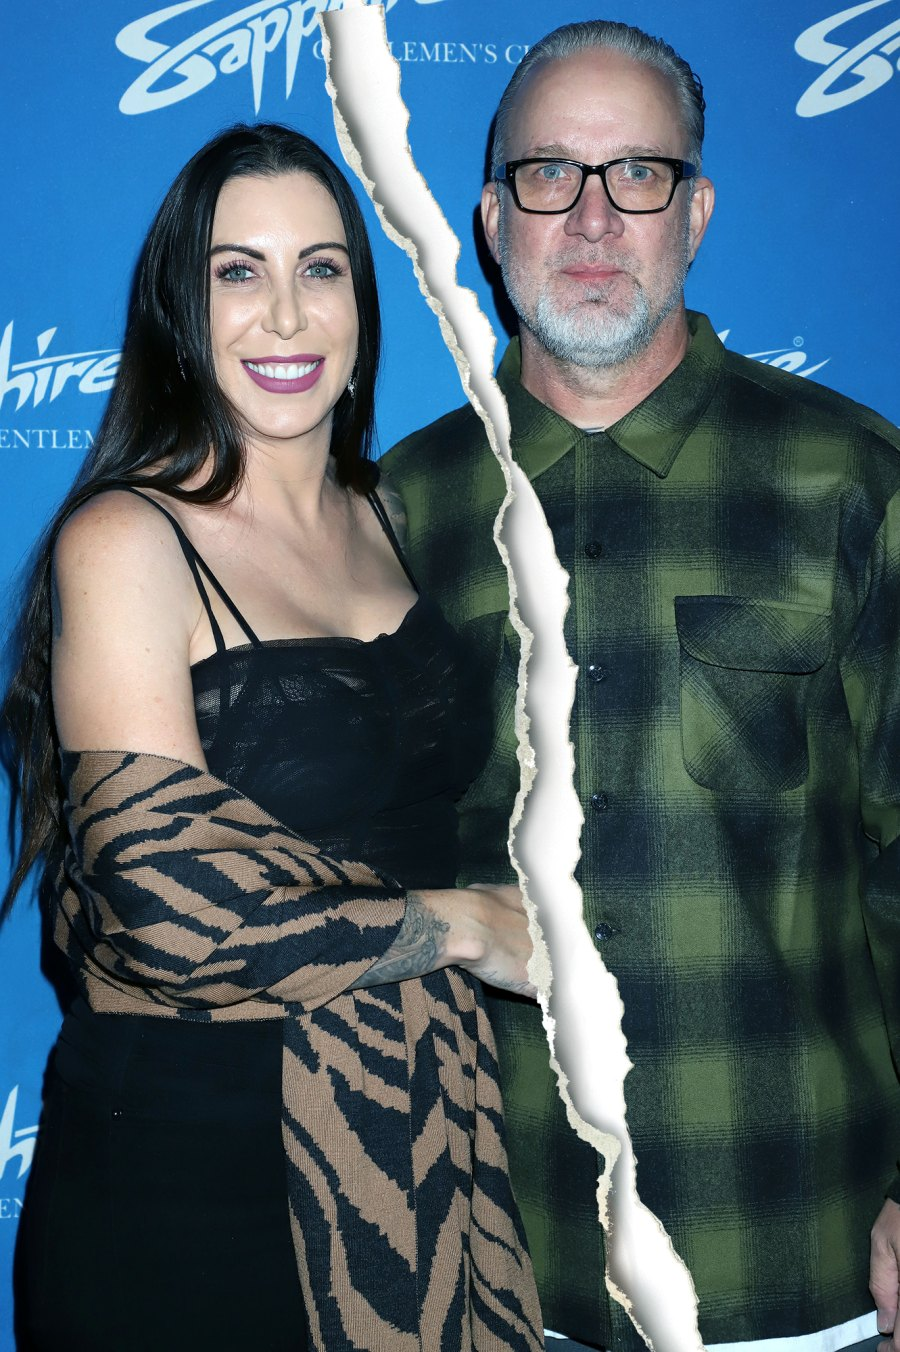 Jesse James and Alexis DeJoria Celebrity Splits of 2020